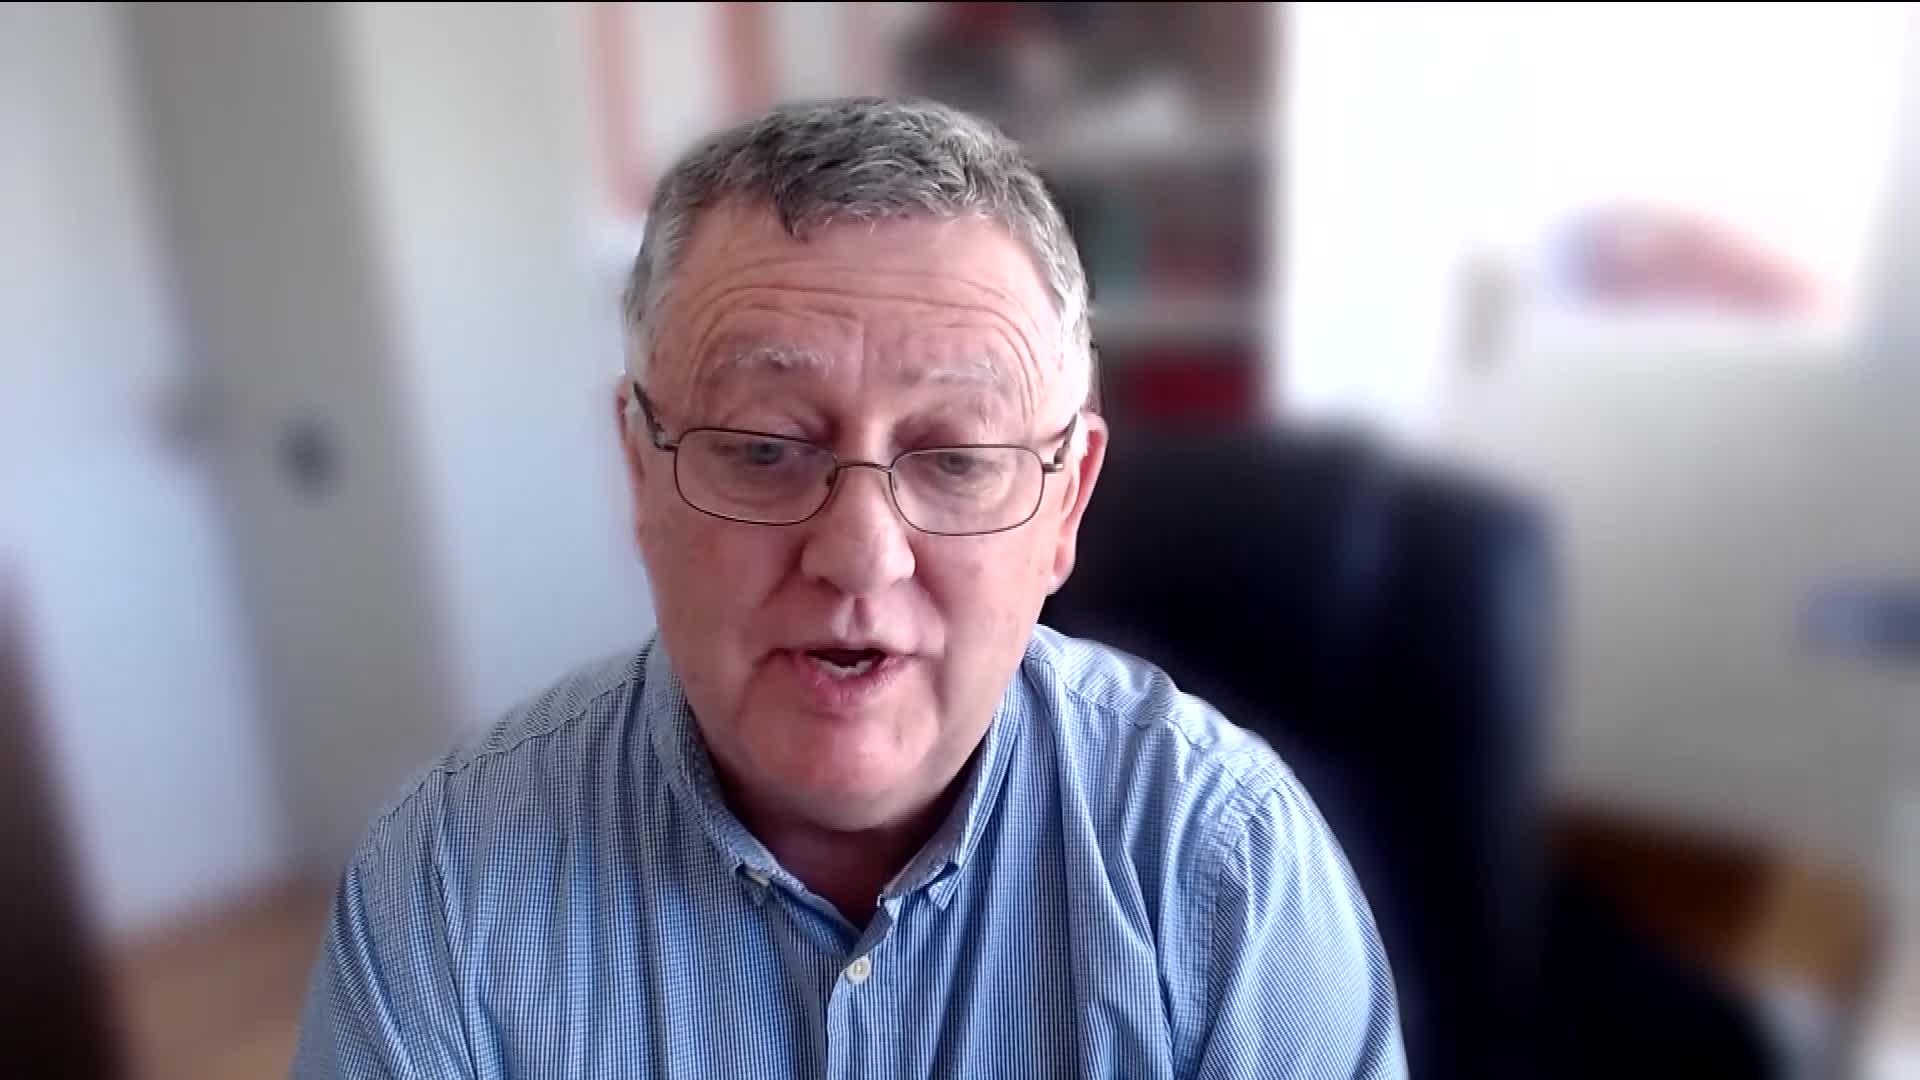 Mike Davidson on Ireland: Am  | Virgin TV  | 6 May 2021